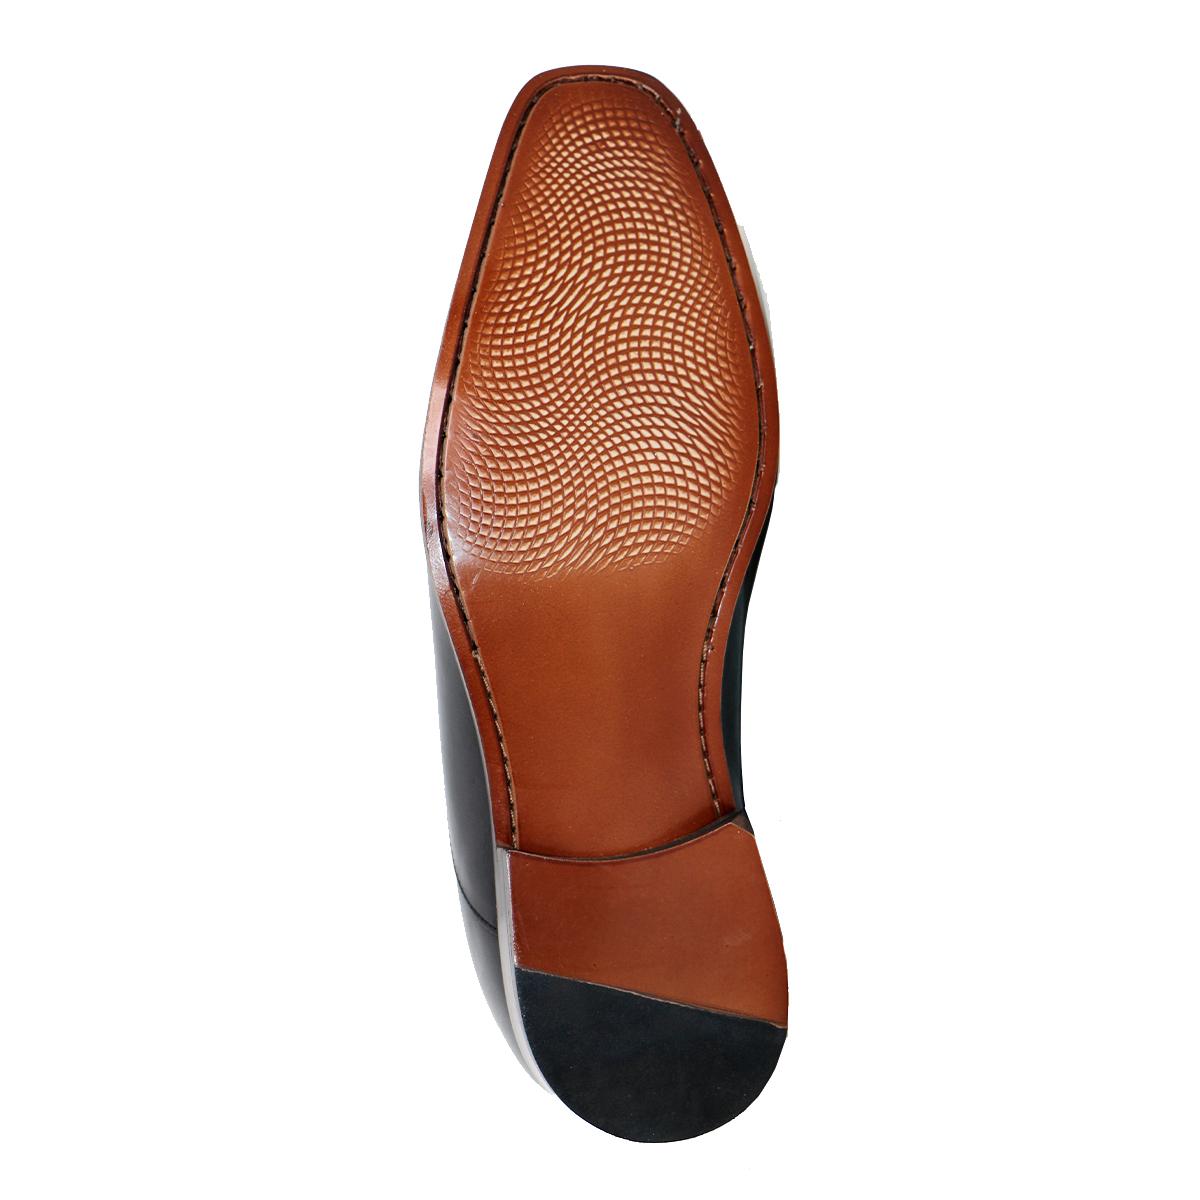 Zapato Formal Director Negro Max Denegri +7cms De Altura_72714